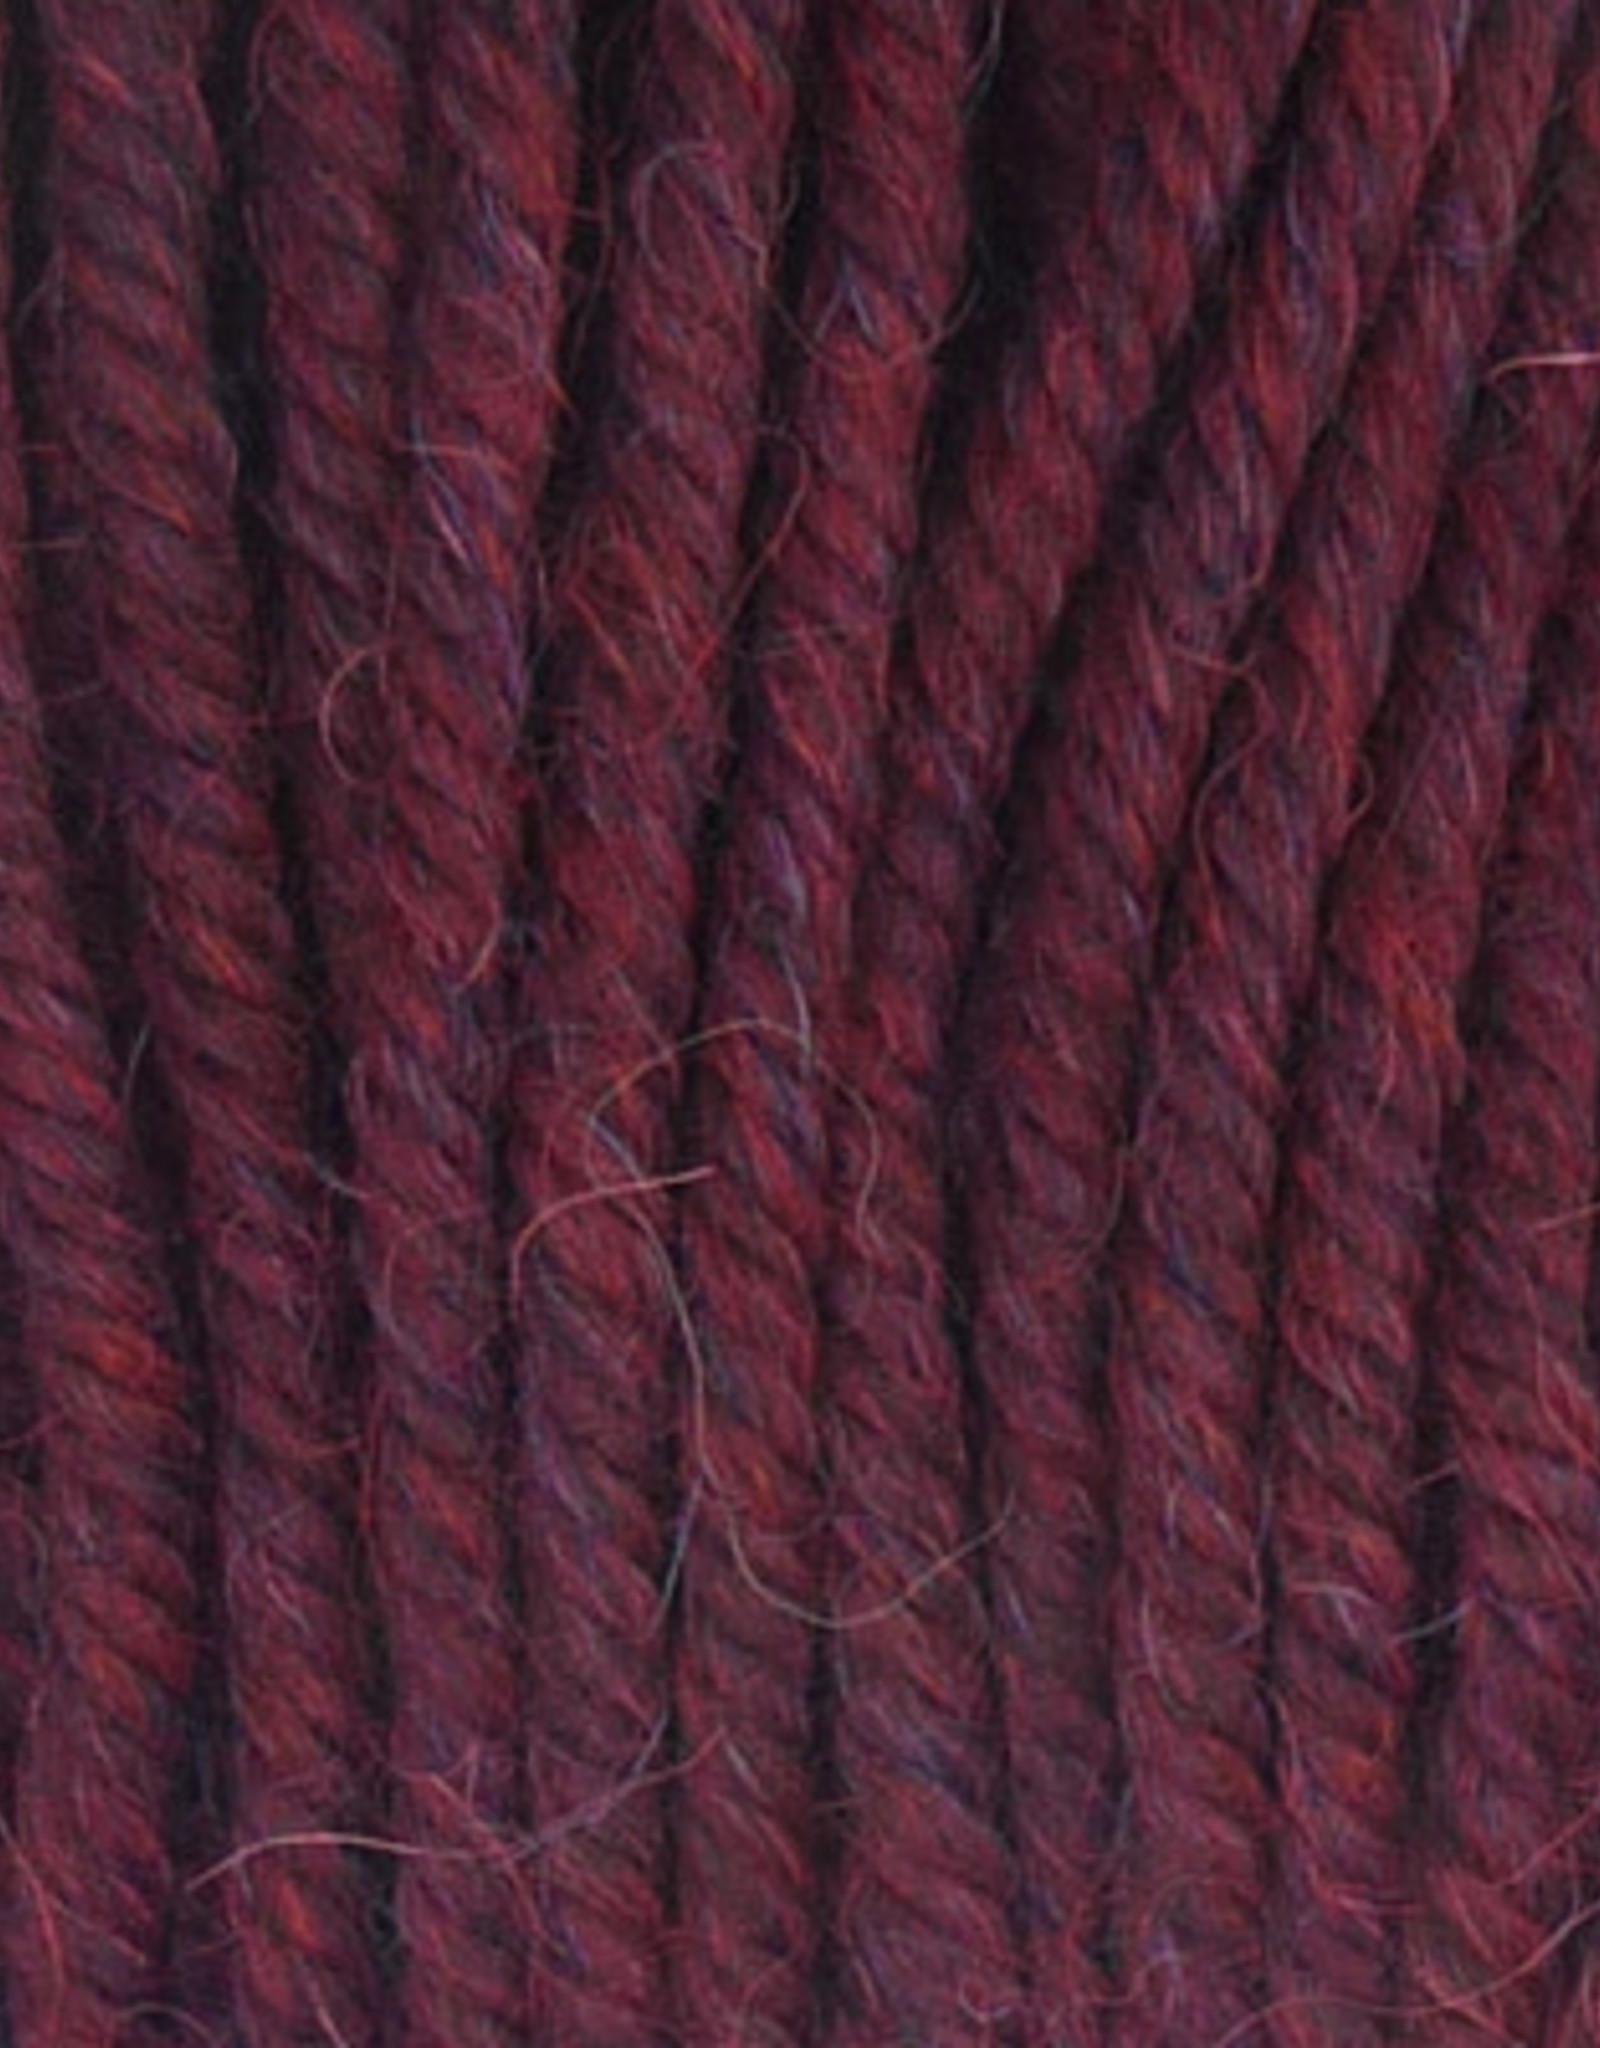 Estelle Alpaca Merino BULKY - 606  Brick